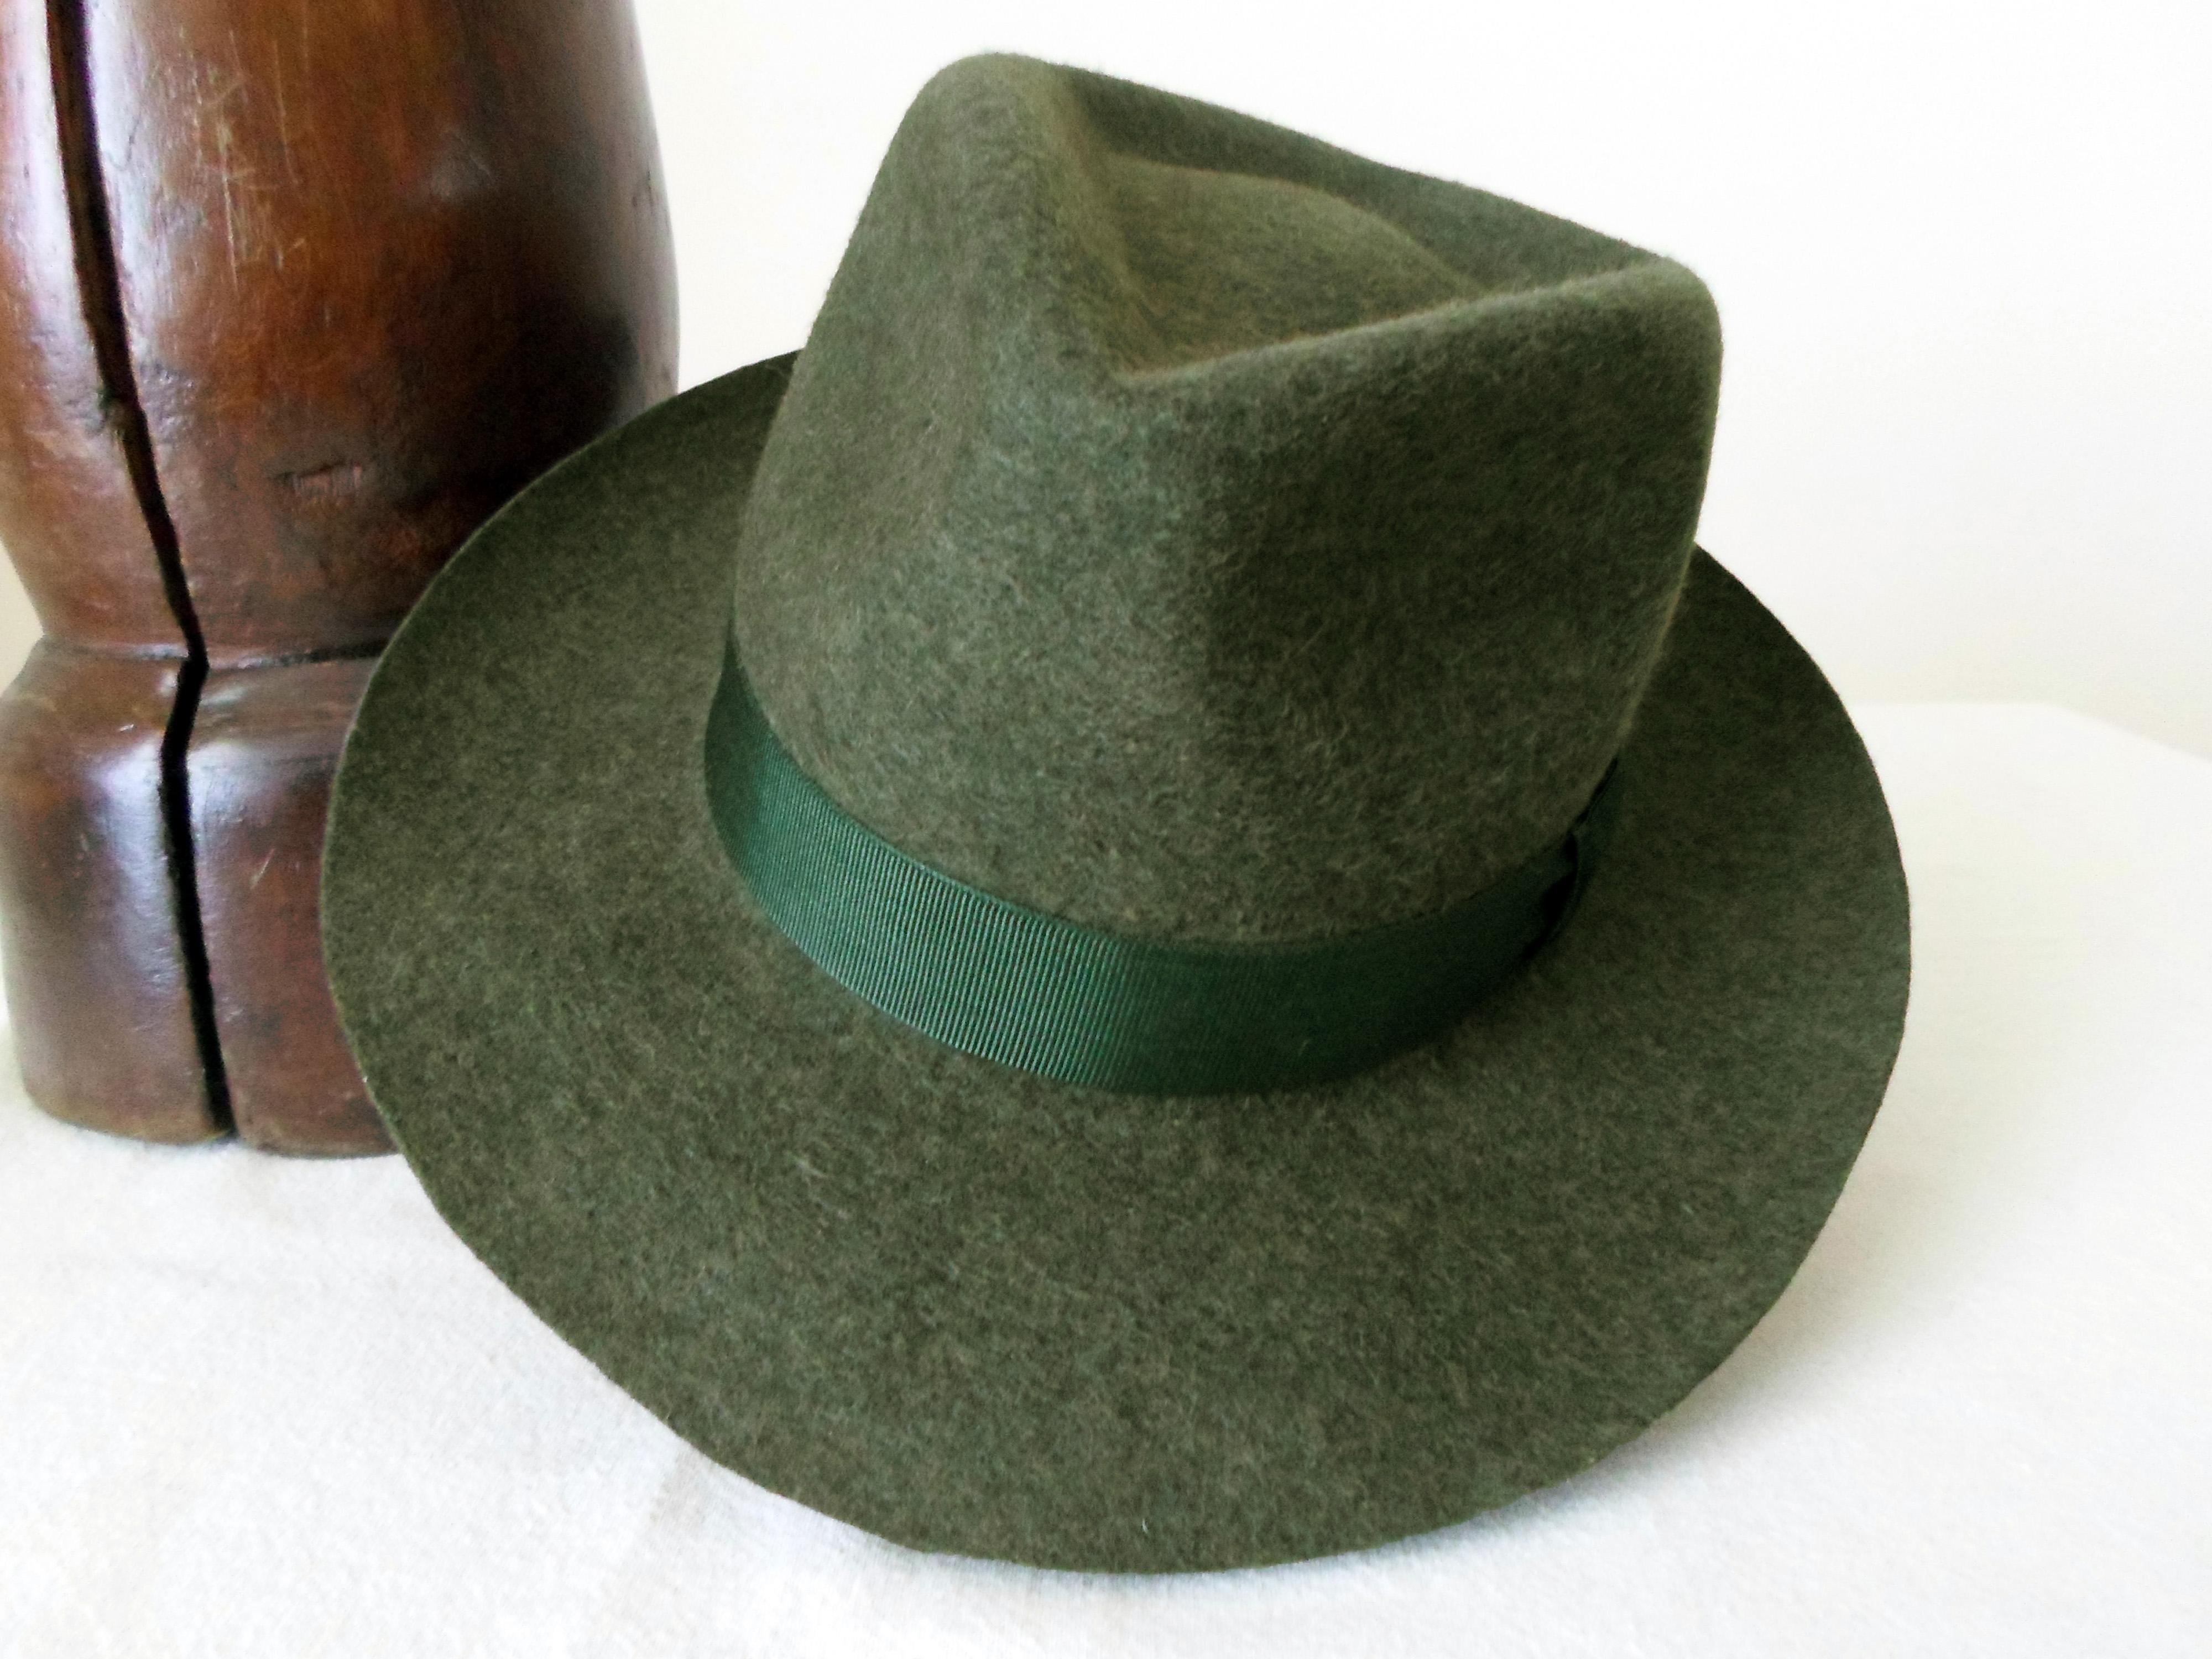 ad24c81ea8 Dark Green Wool Felt Fedora - Wide Brim Pure Wool Felt Handmade Fedora Hat  - Men Women